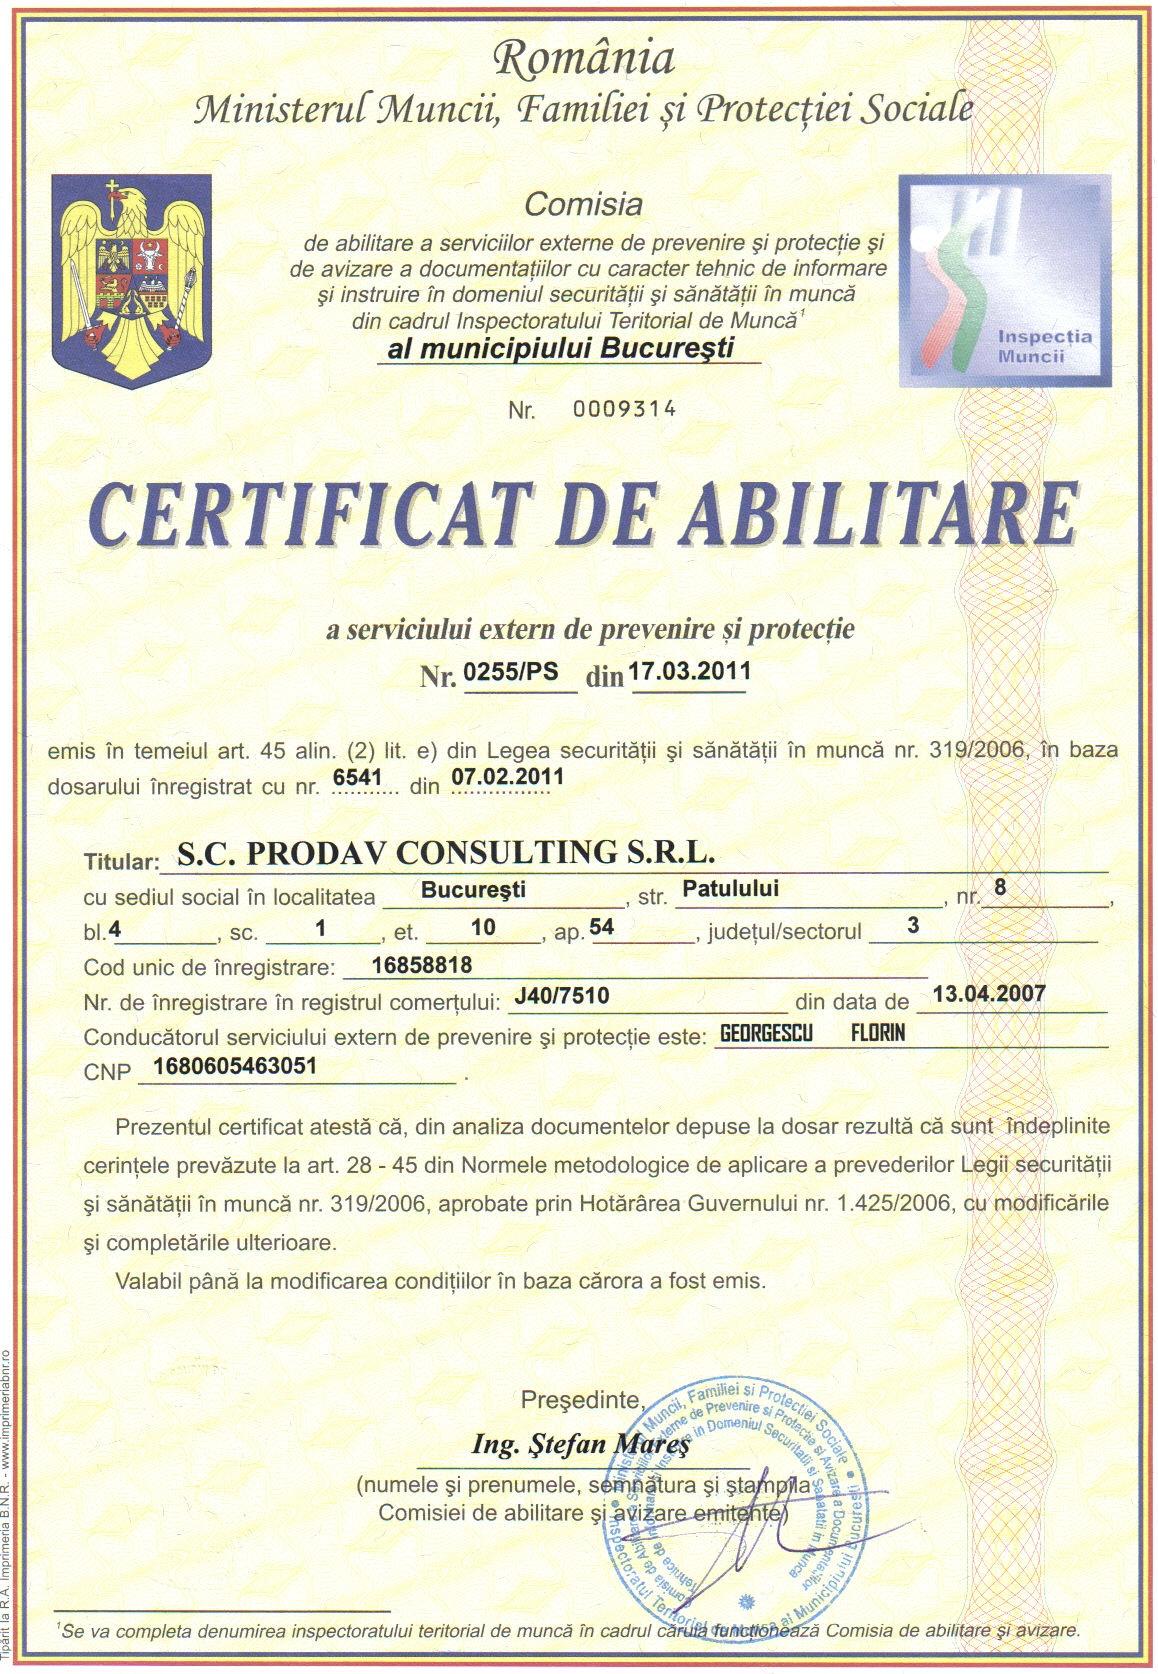 CERTIFICAT ABILITARE SSM PRODAV CONSULTING - SERVICIU EXTERN DE PREVENIRE SI PROTECTIE